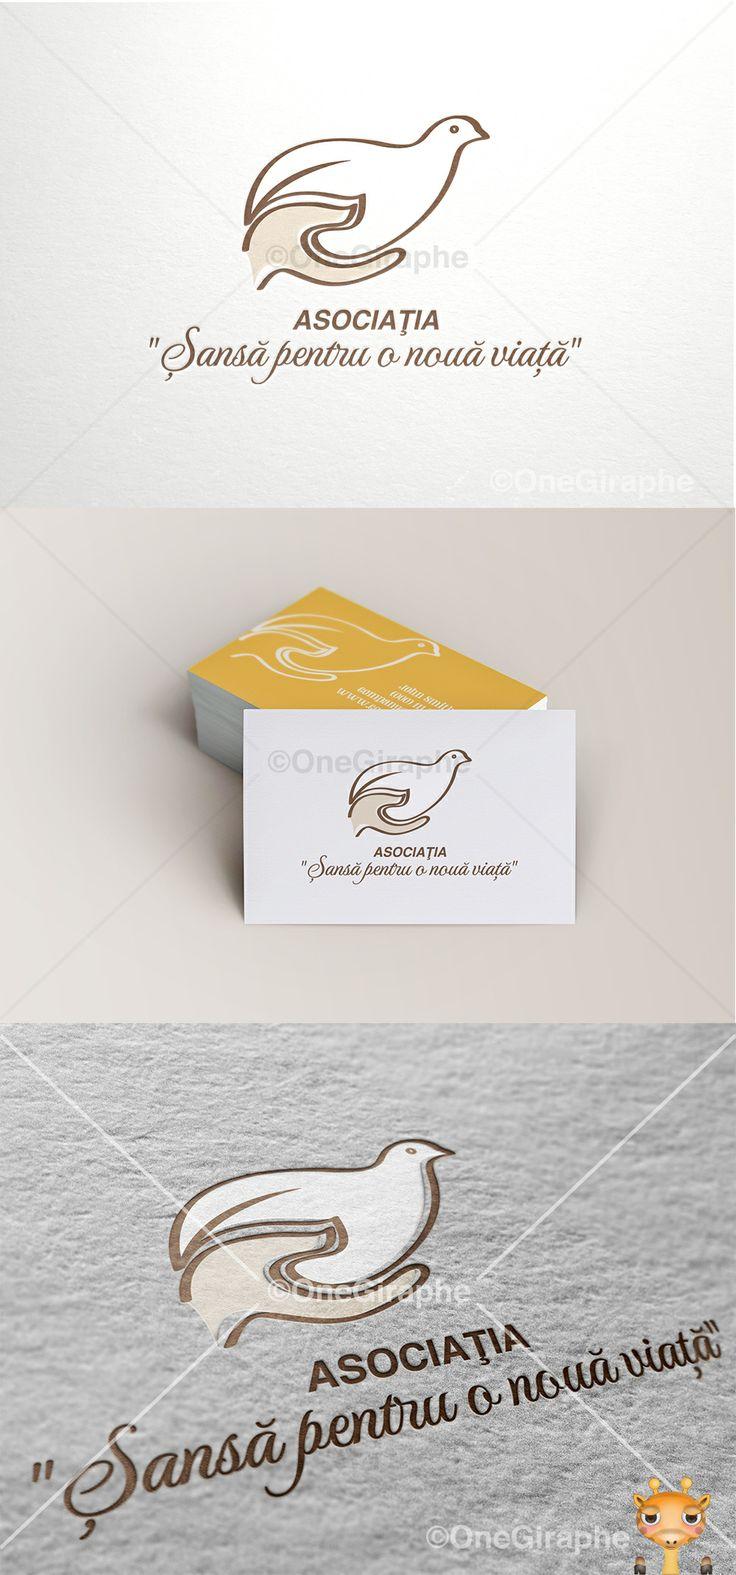 Chance for a new life! #pigeon #dove  #children #child #kids #mom #logo #logodesign #cute #graphic #design #designer #portfolio #behance #logopond #brandstack #sweet #logodesign #designer #brand #brandidentity #brandstack #logo #logodesign #graphicdesign #logopond #behance #tree #flowers #heart #love #bird